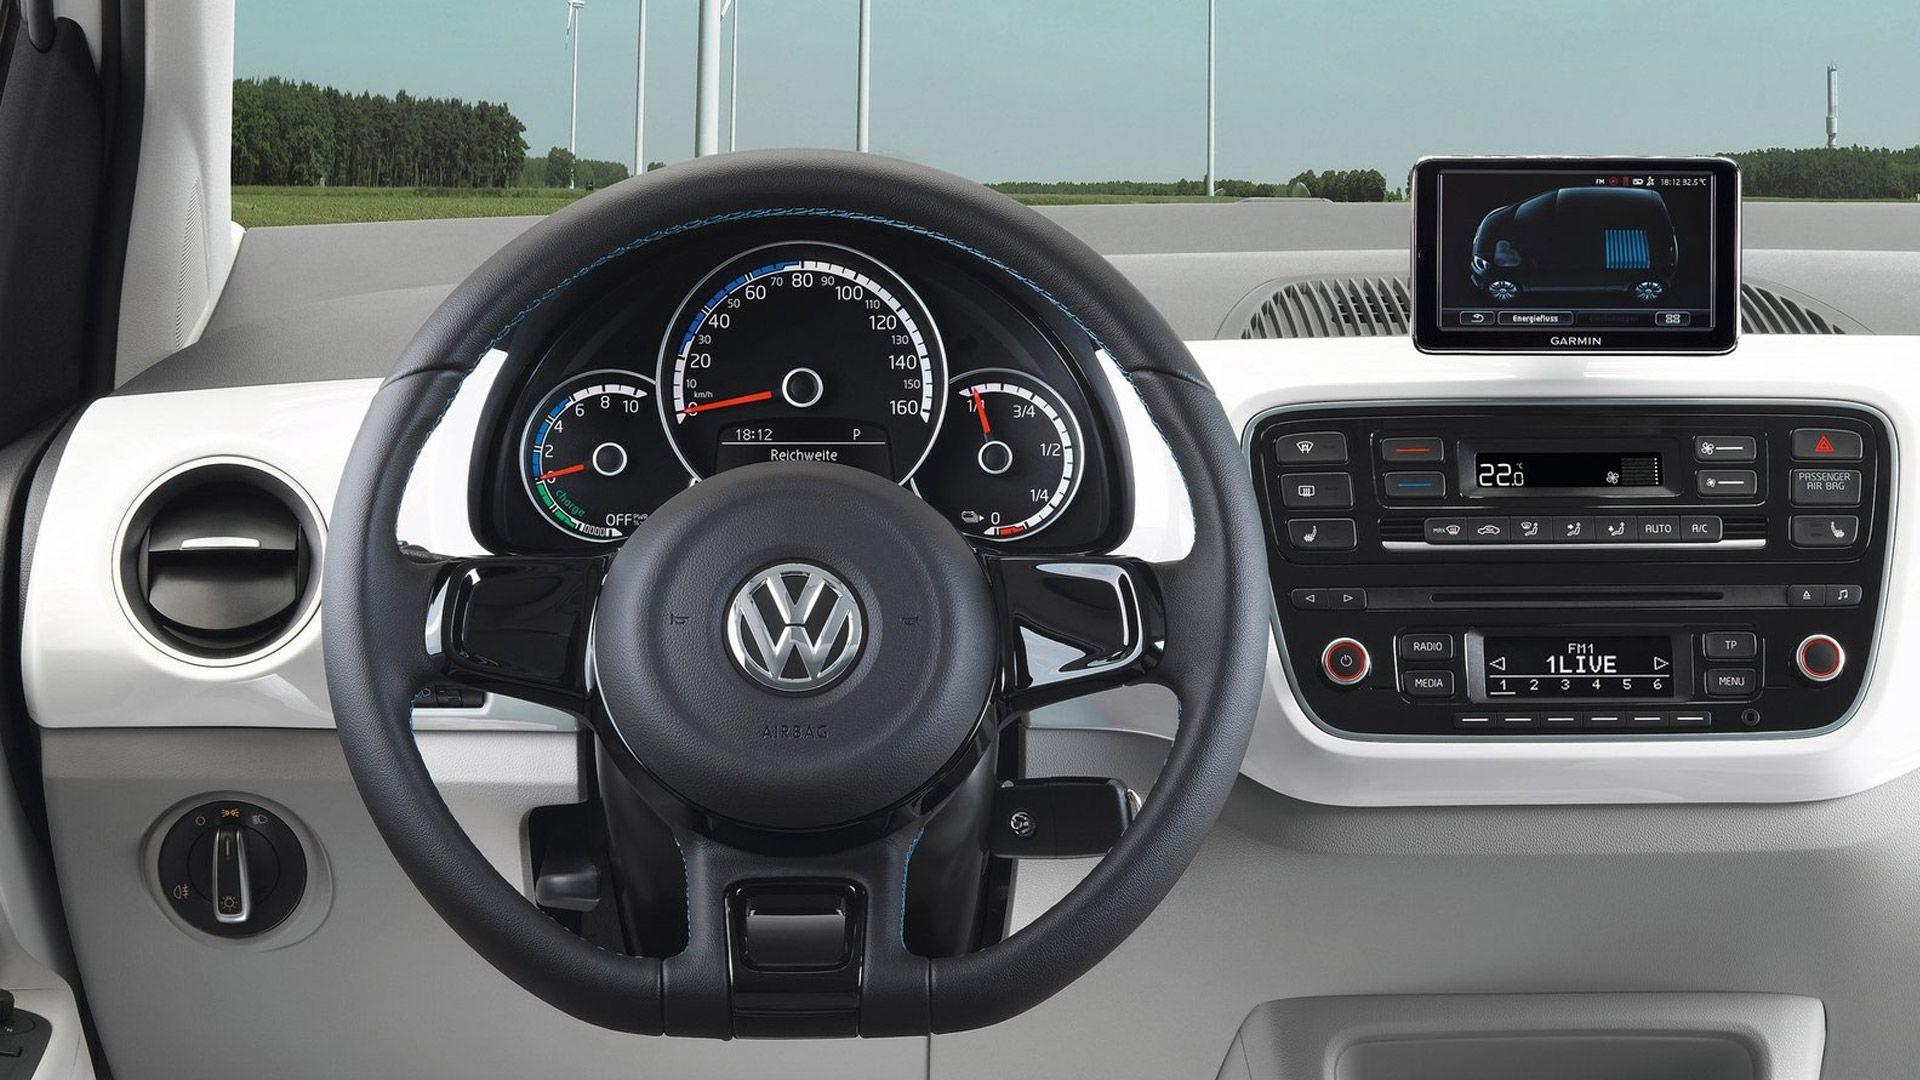 Volkswagen E Up Dashboard 2014 Volkswagen E Up Vs E Golf